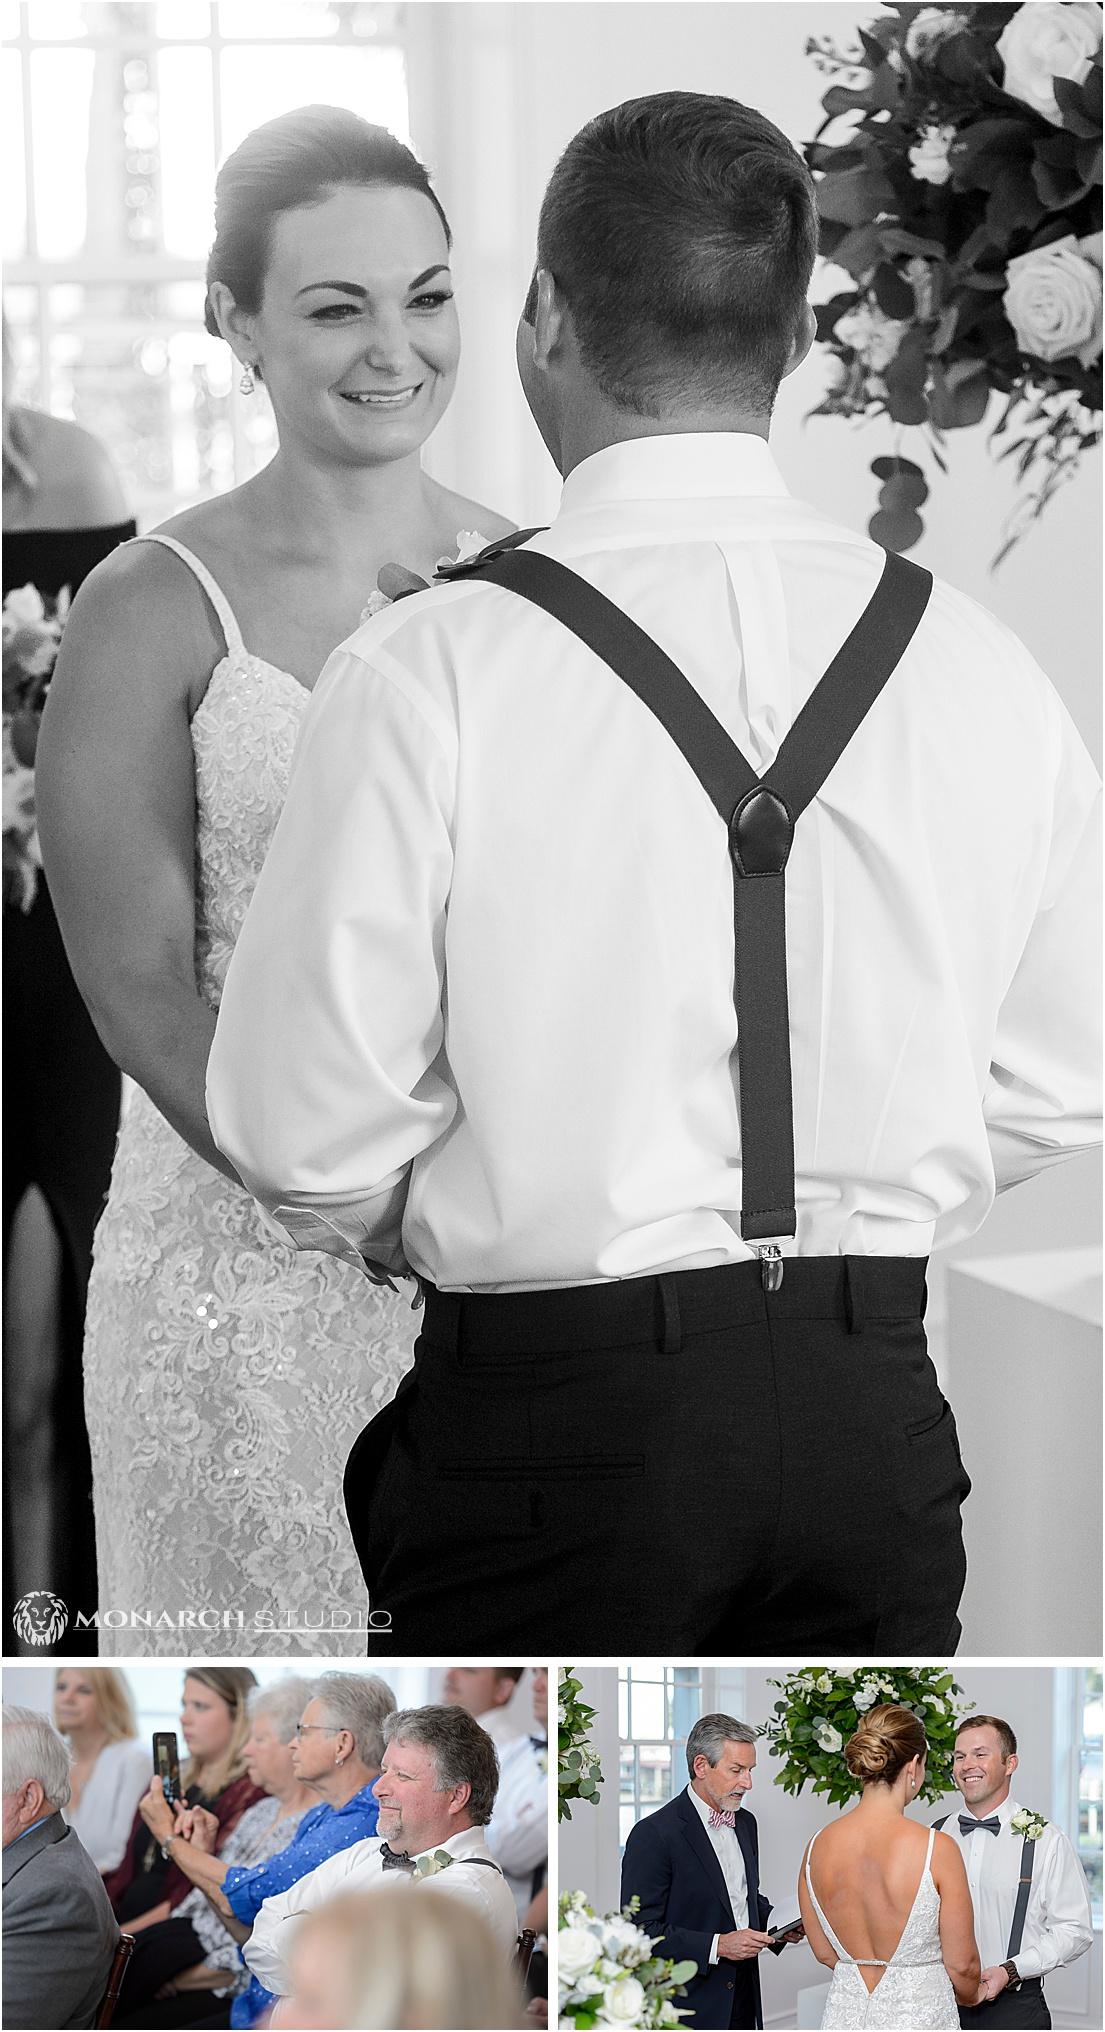 073-whiteroom-wedding-photographer-2019-05-22_0055.jpg